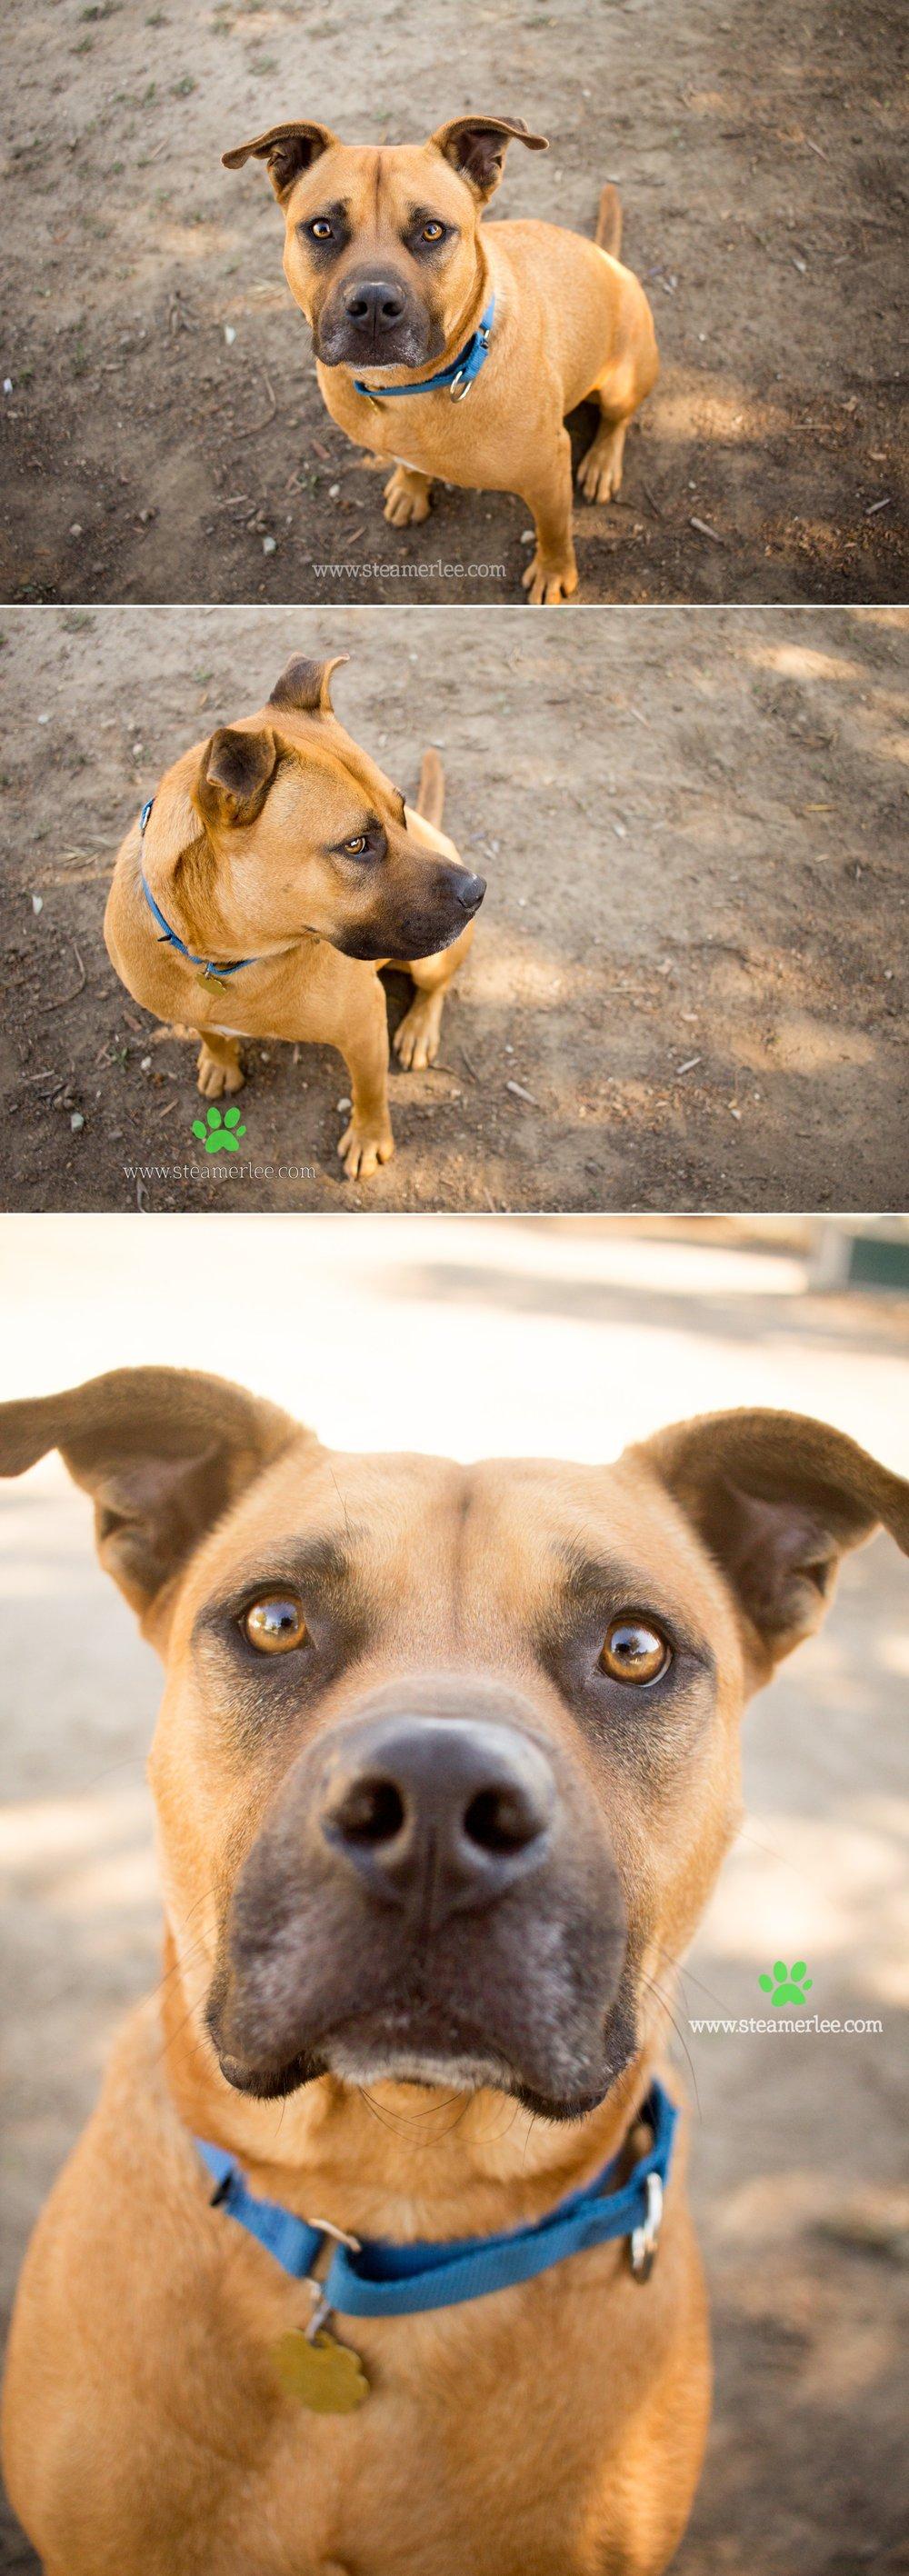 05 Steamer Lee Dog Photography - Seal Beach Animal Care Center.JPG